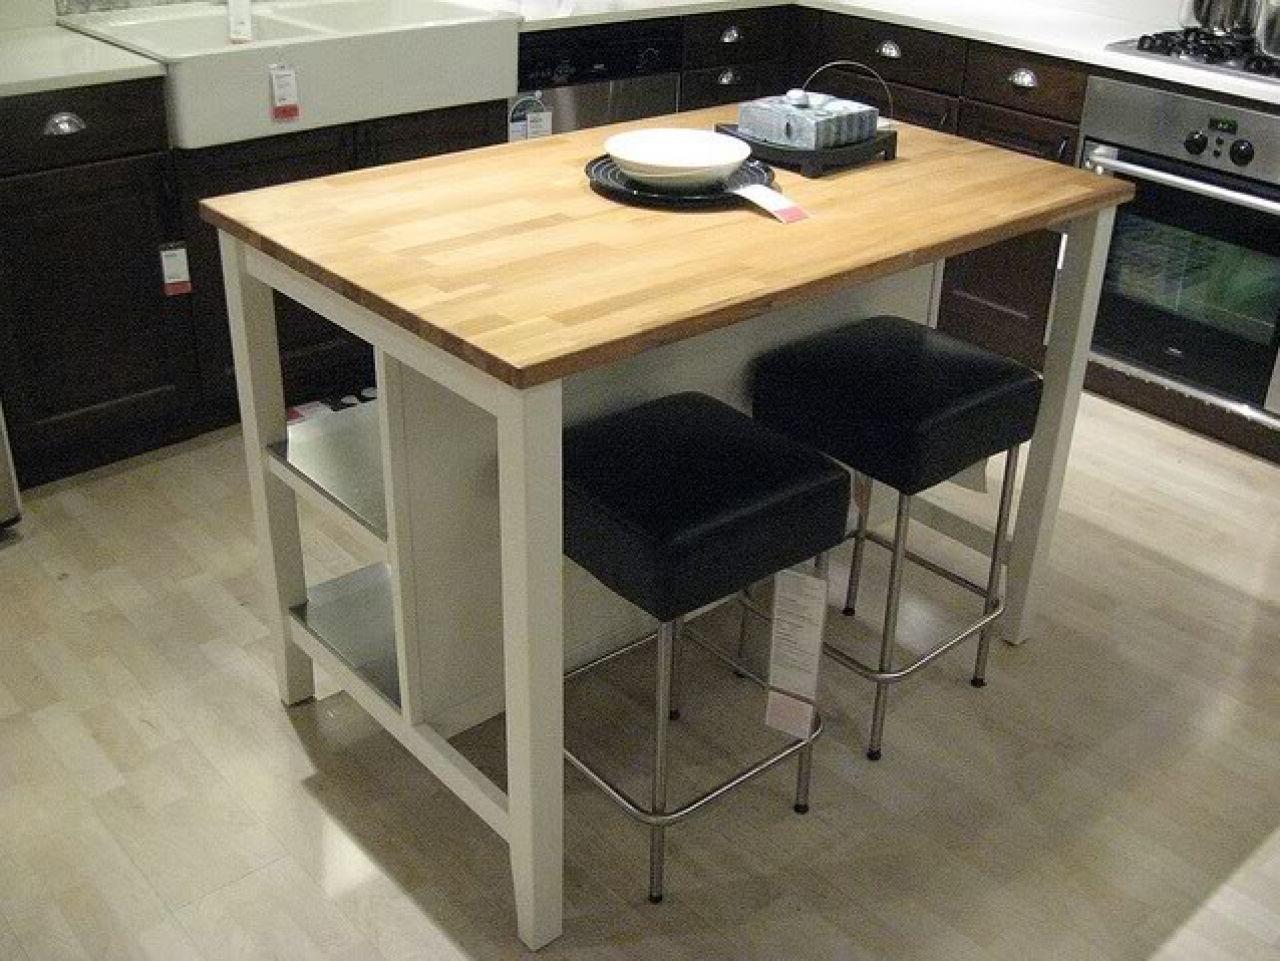 Ikea kitchen islands plans http www colgardensbb com ikea